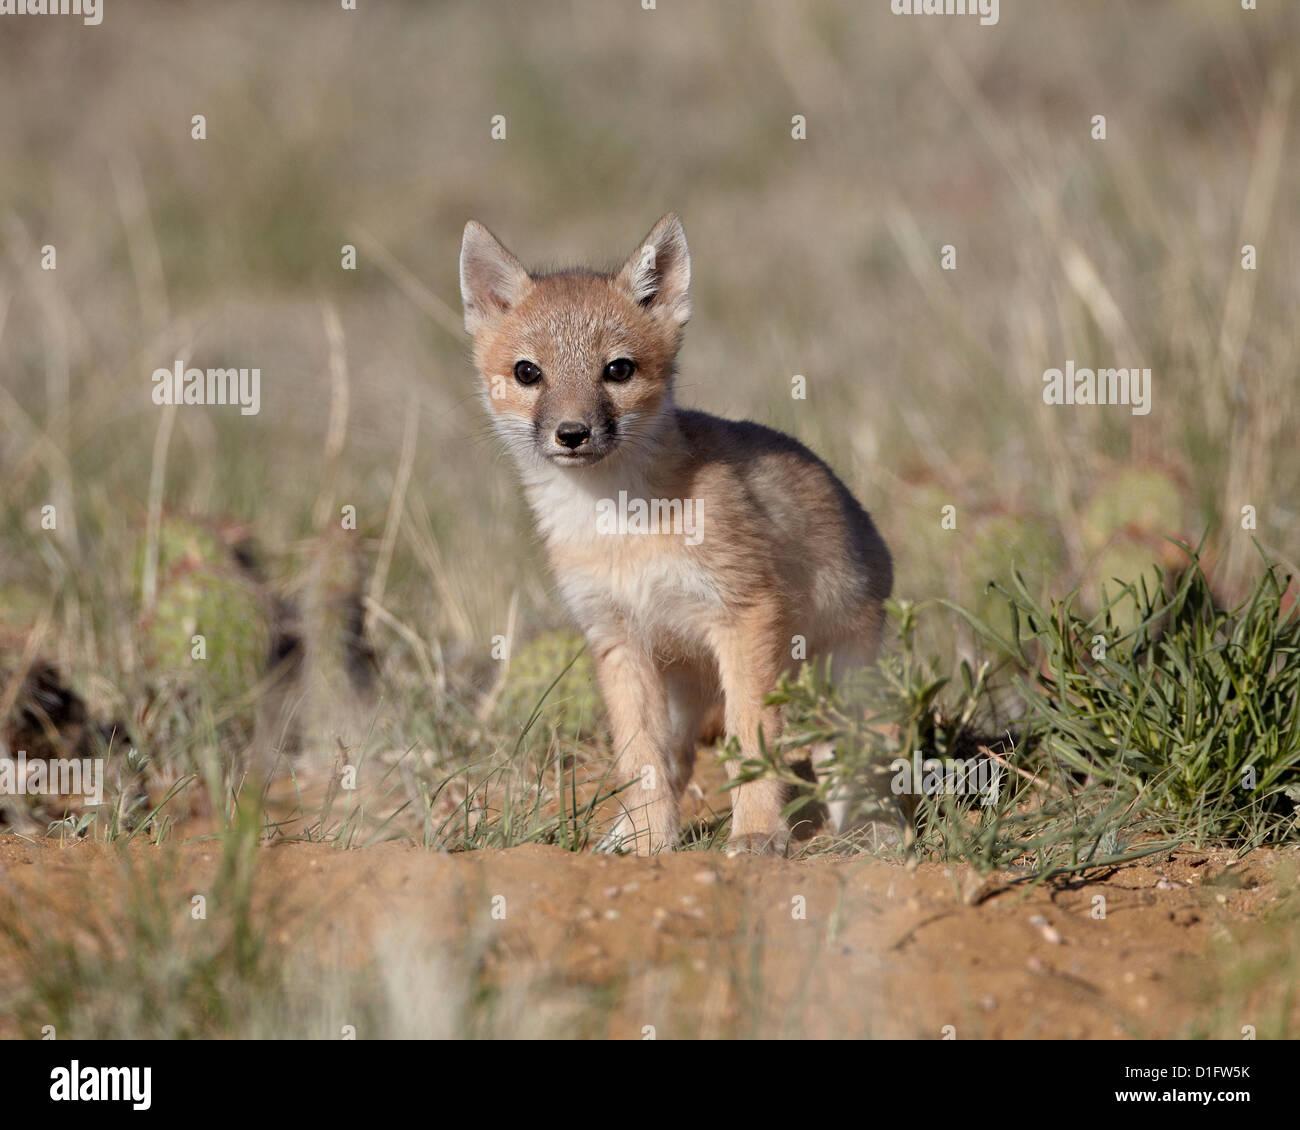 Swift fox (Vulpes velox) kit, Pawnee National Grassland, Colorado, United States of America, North America - Stock Image